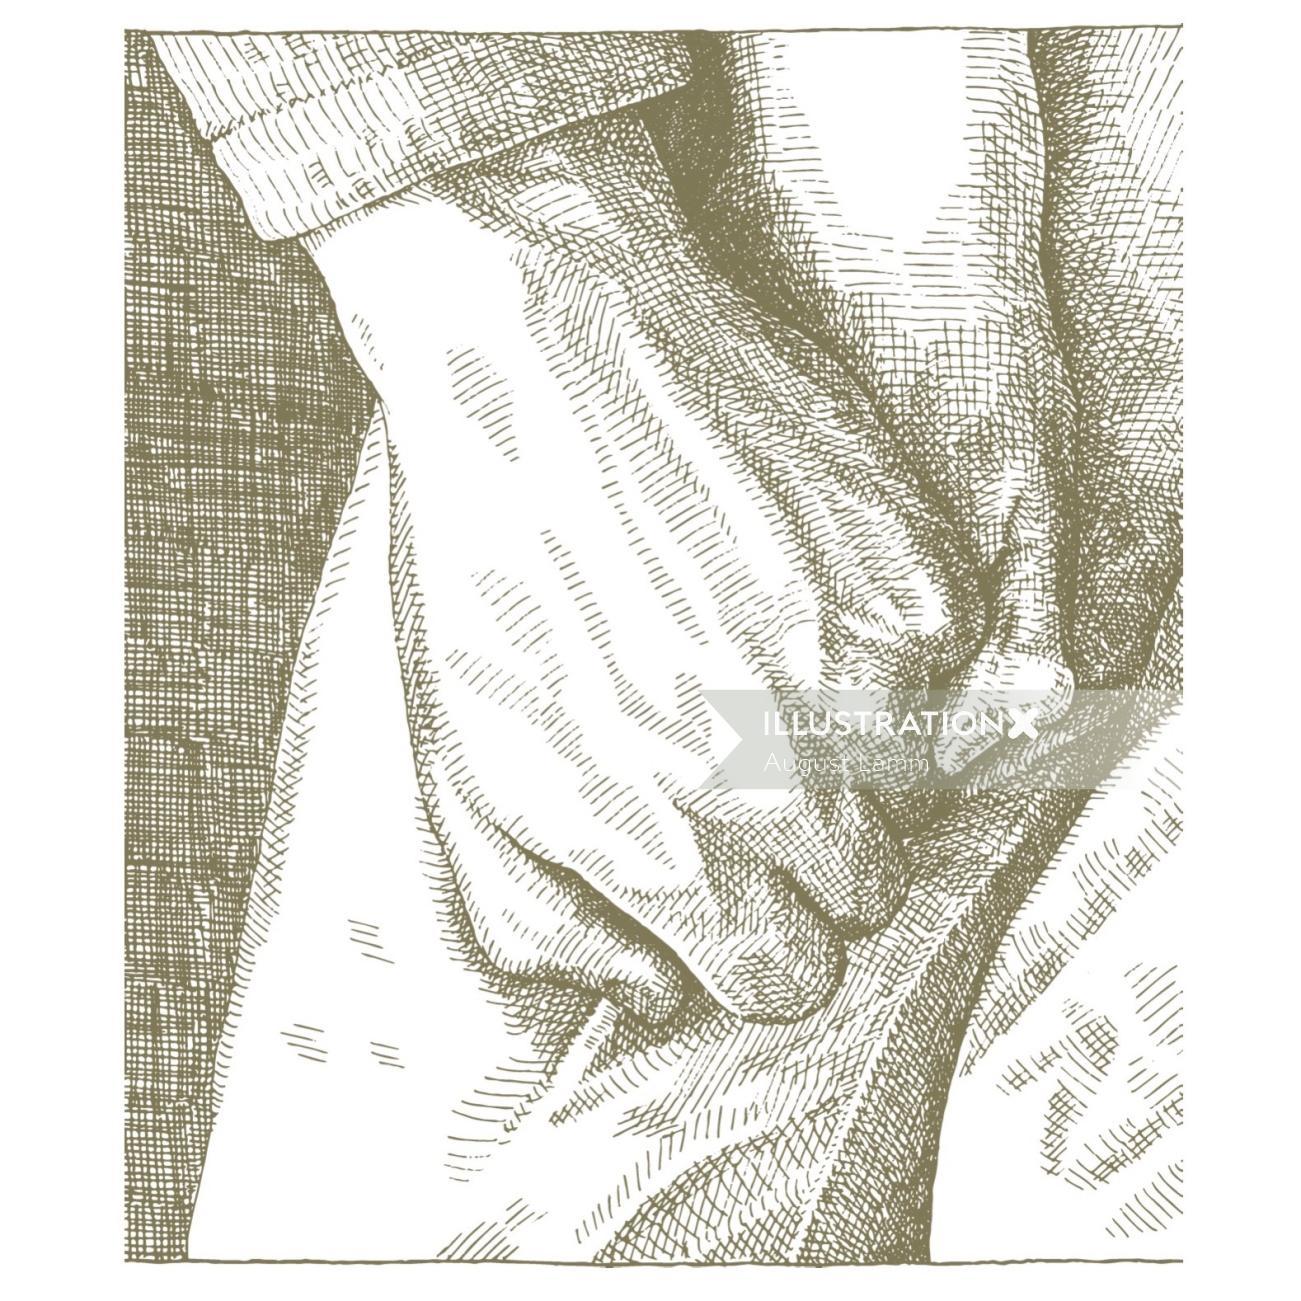 Holding hands black and white illustration